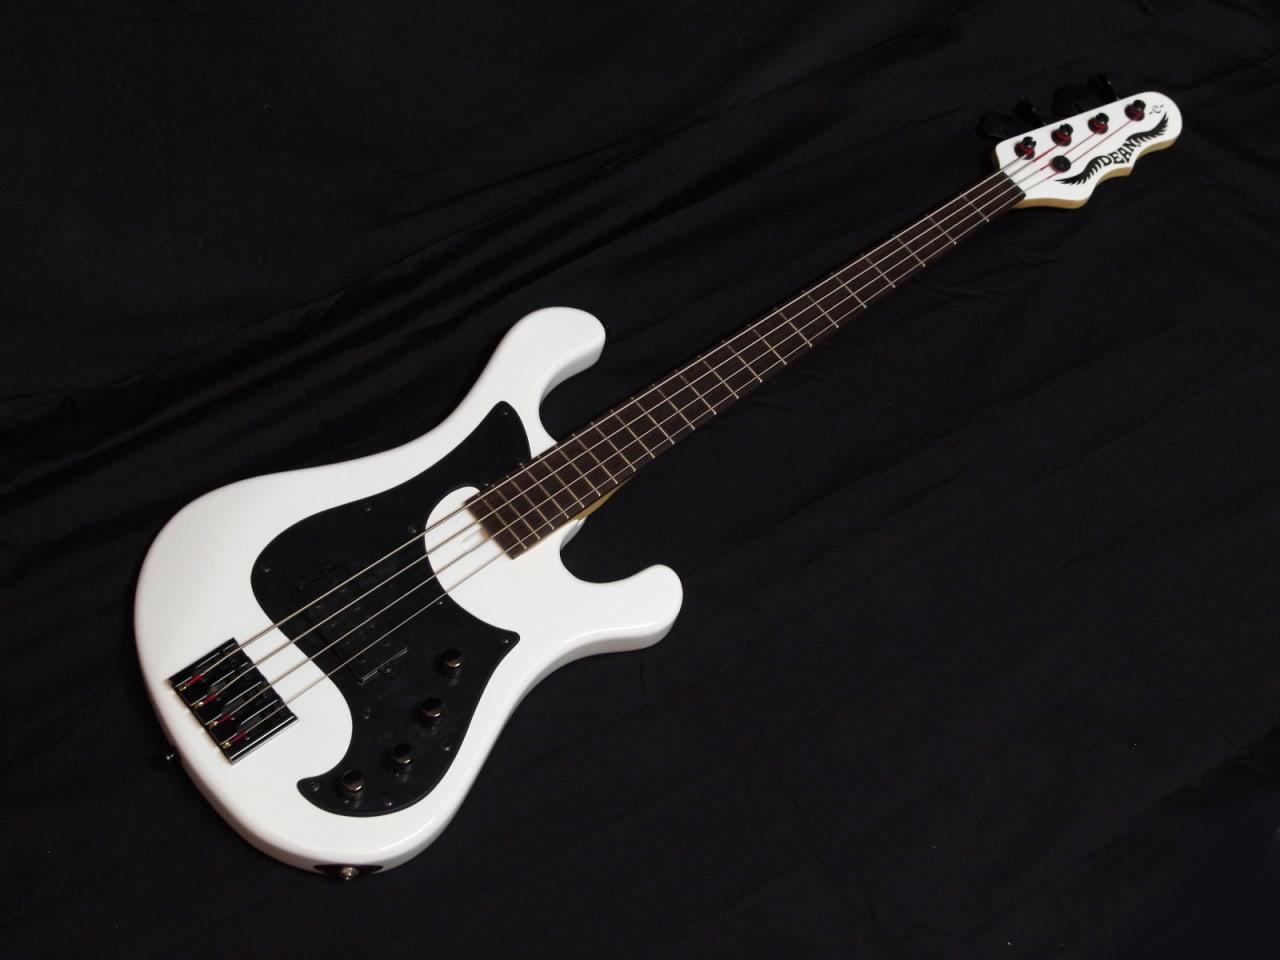 dean eric bass hillsboro 4 string bass guitar new classic reverb. Black Bedroom Furniture Sets. Home Design Ideas